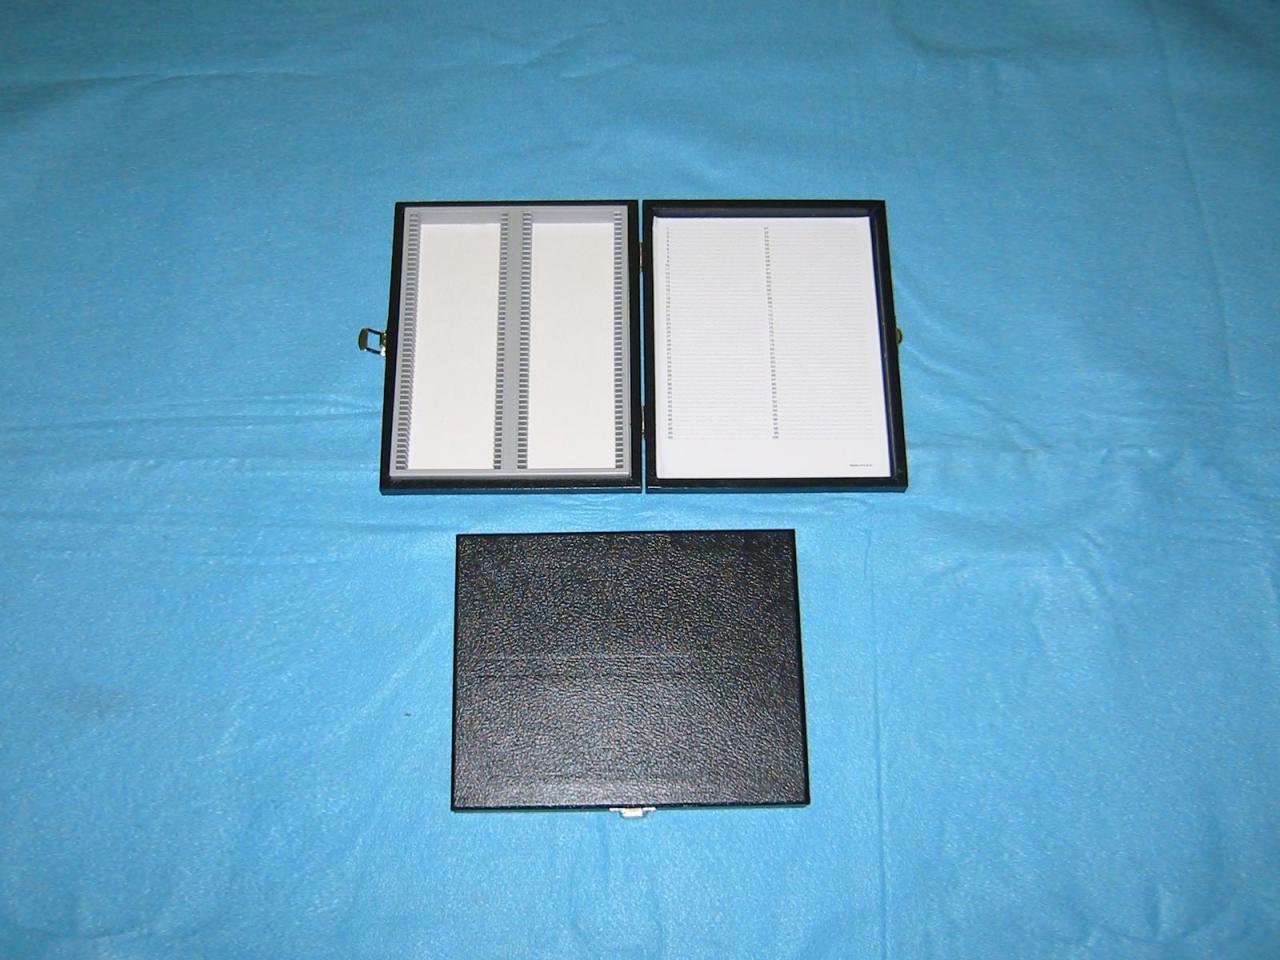 MICRO SLIDE BOXES